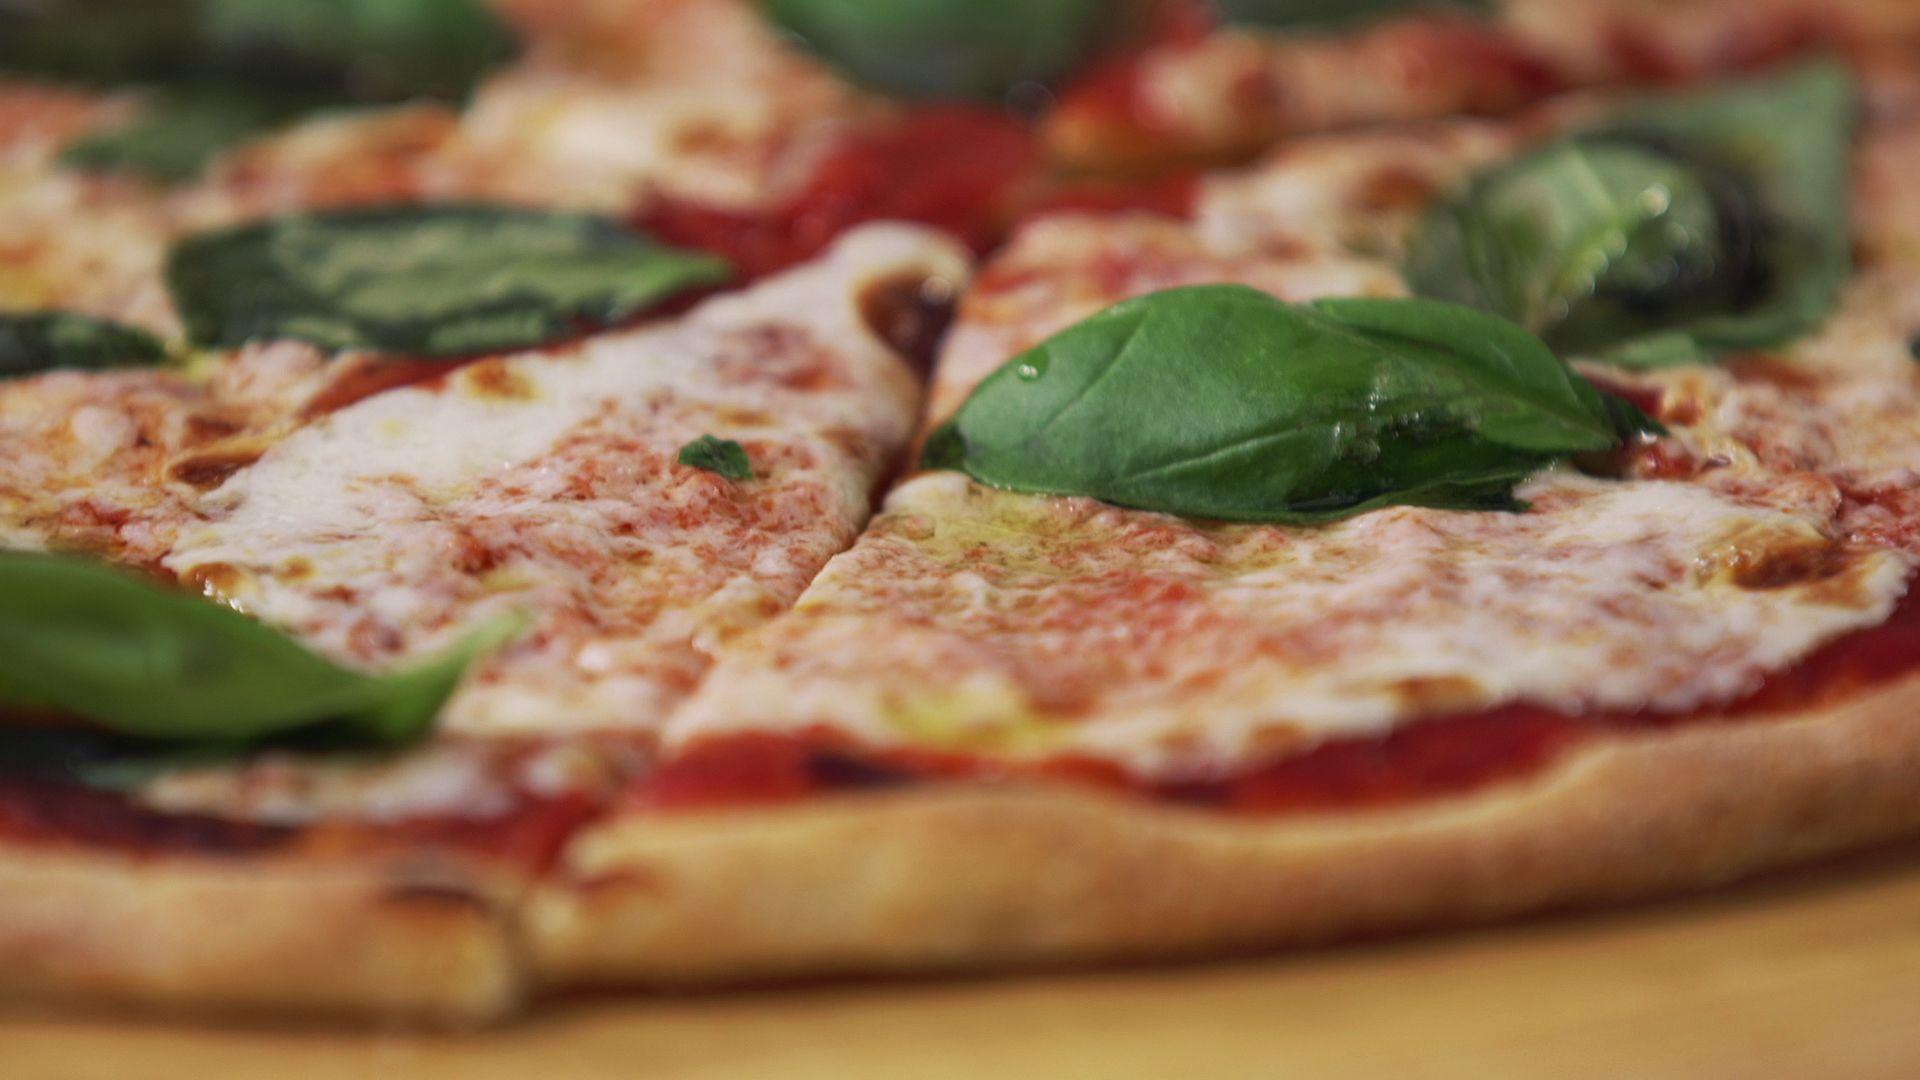 Mario Batali's Classic Homemade Pizza Recipe